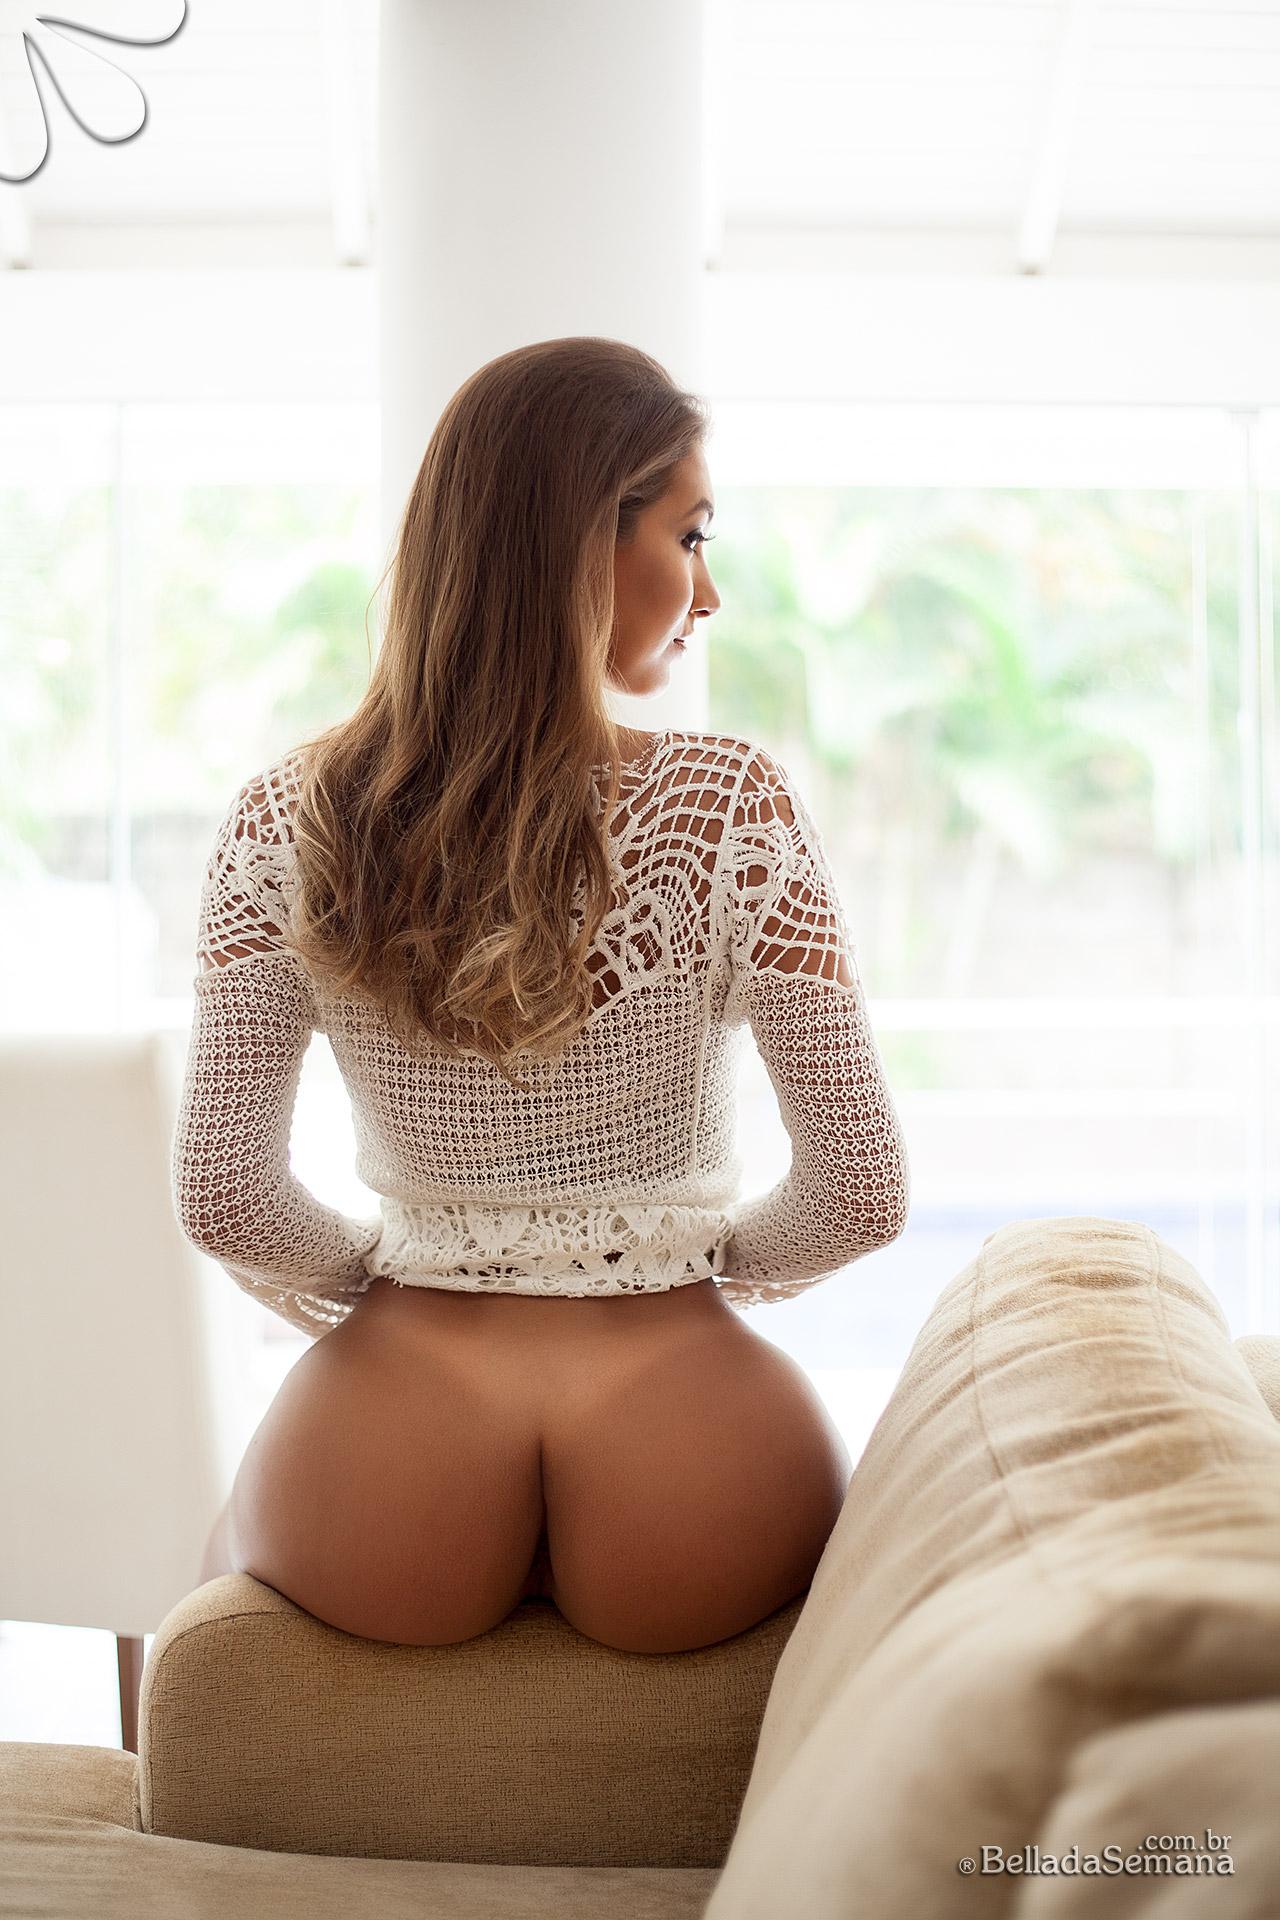 Bella da Semana : Beatriz Fida